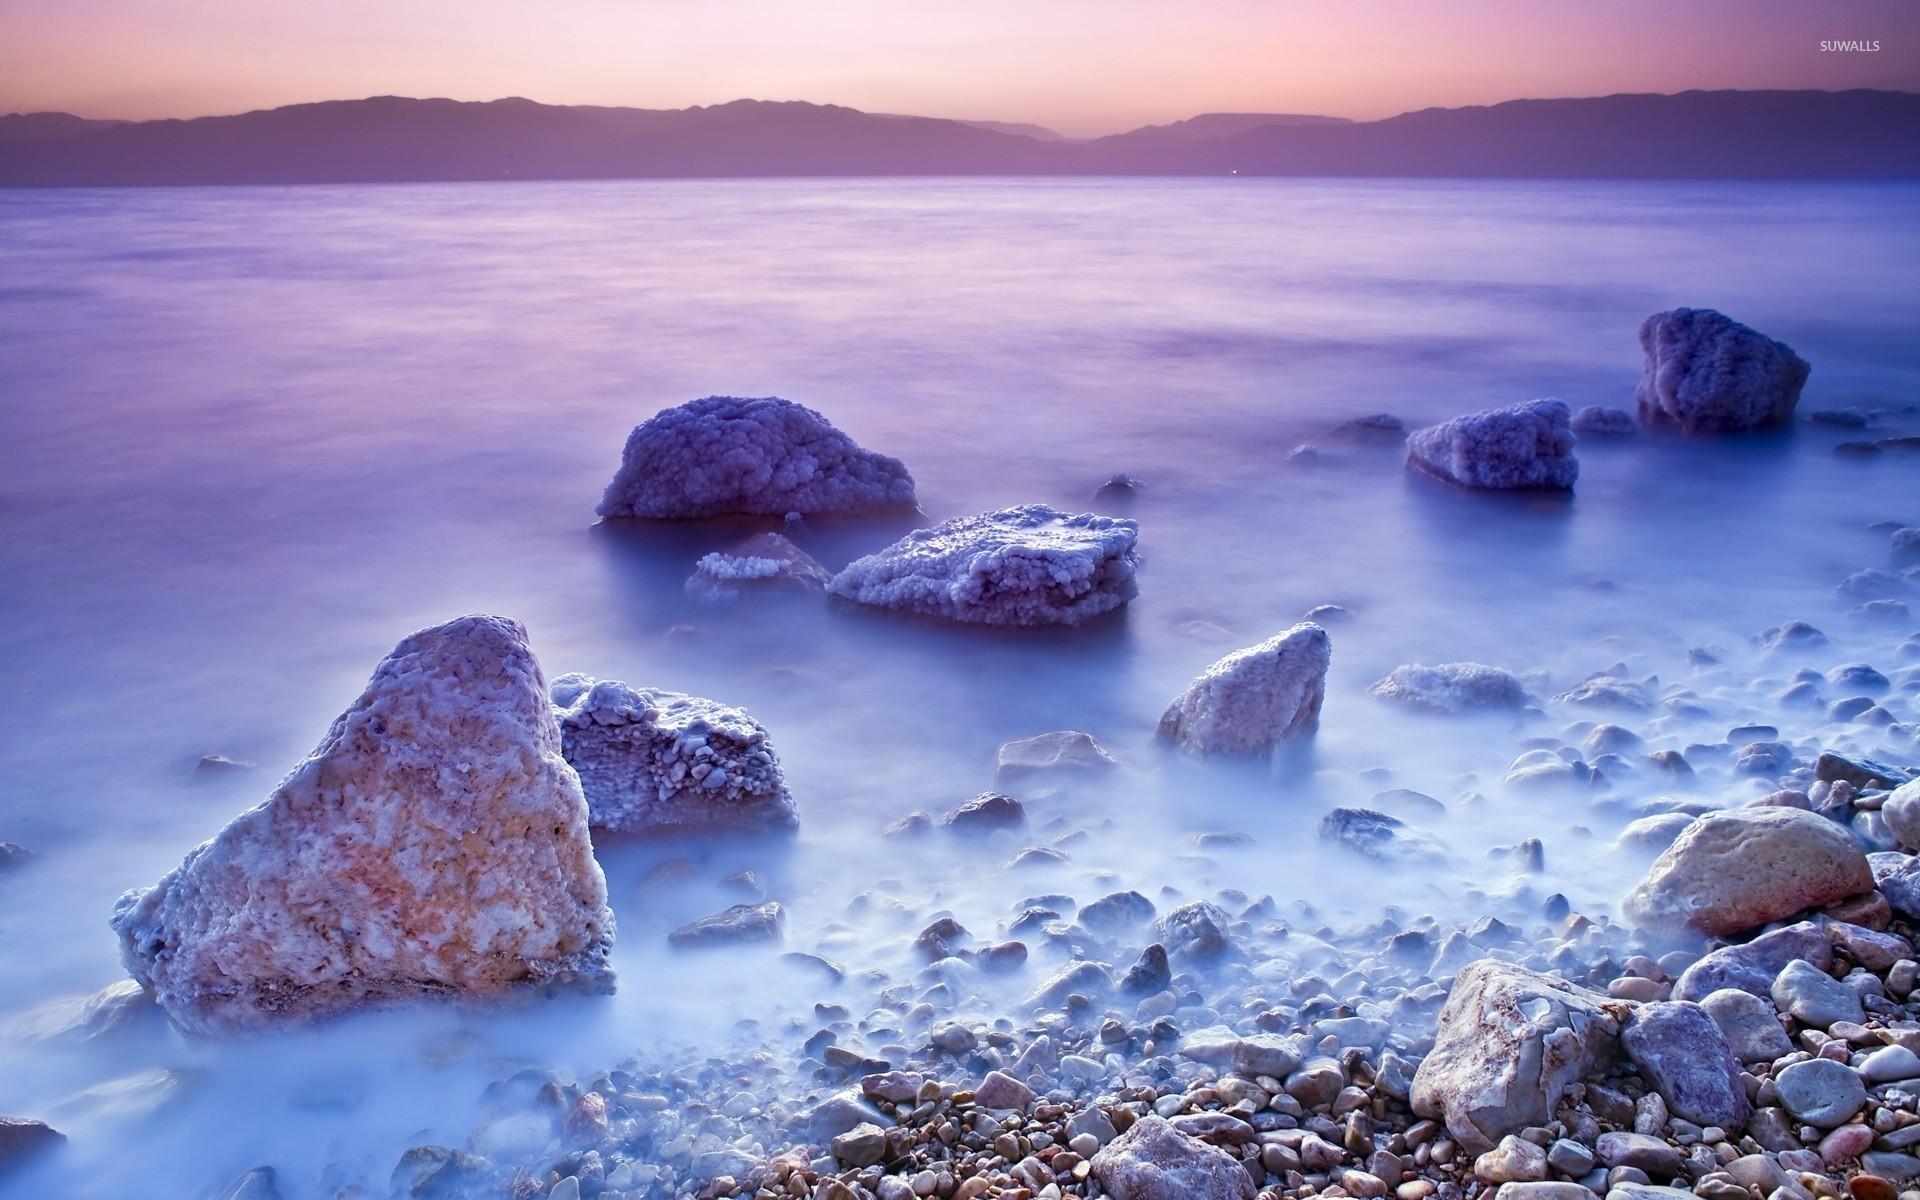 Free Fall Desktop Wallpaper Downloads Dead Sea Wallpaper Photography Wallpapers 22784